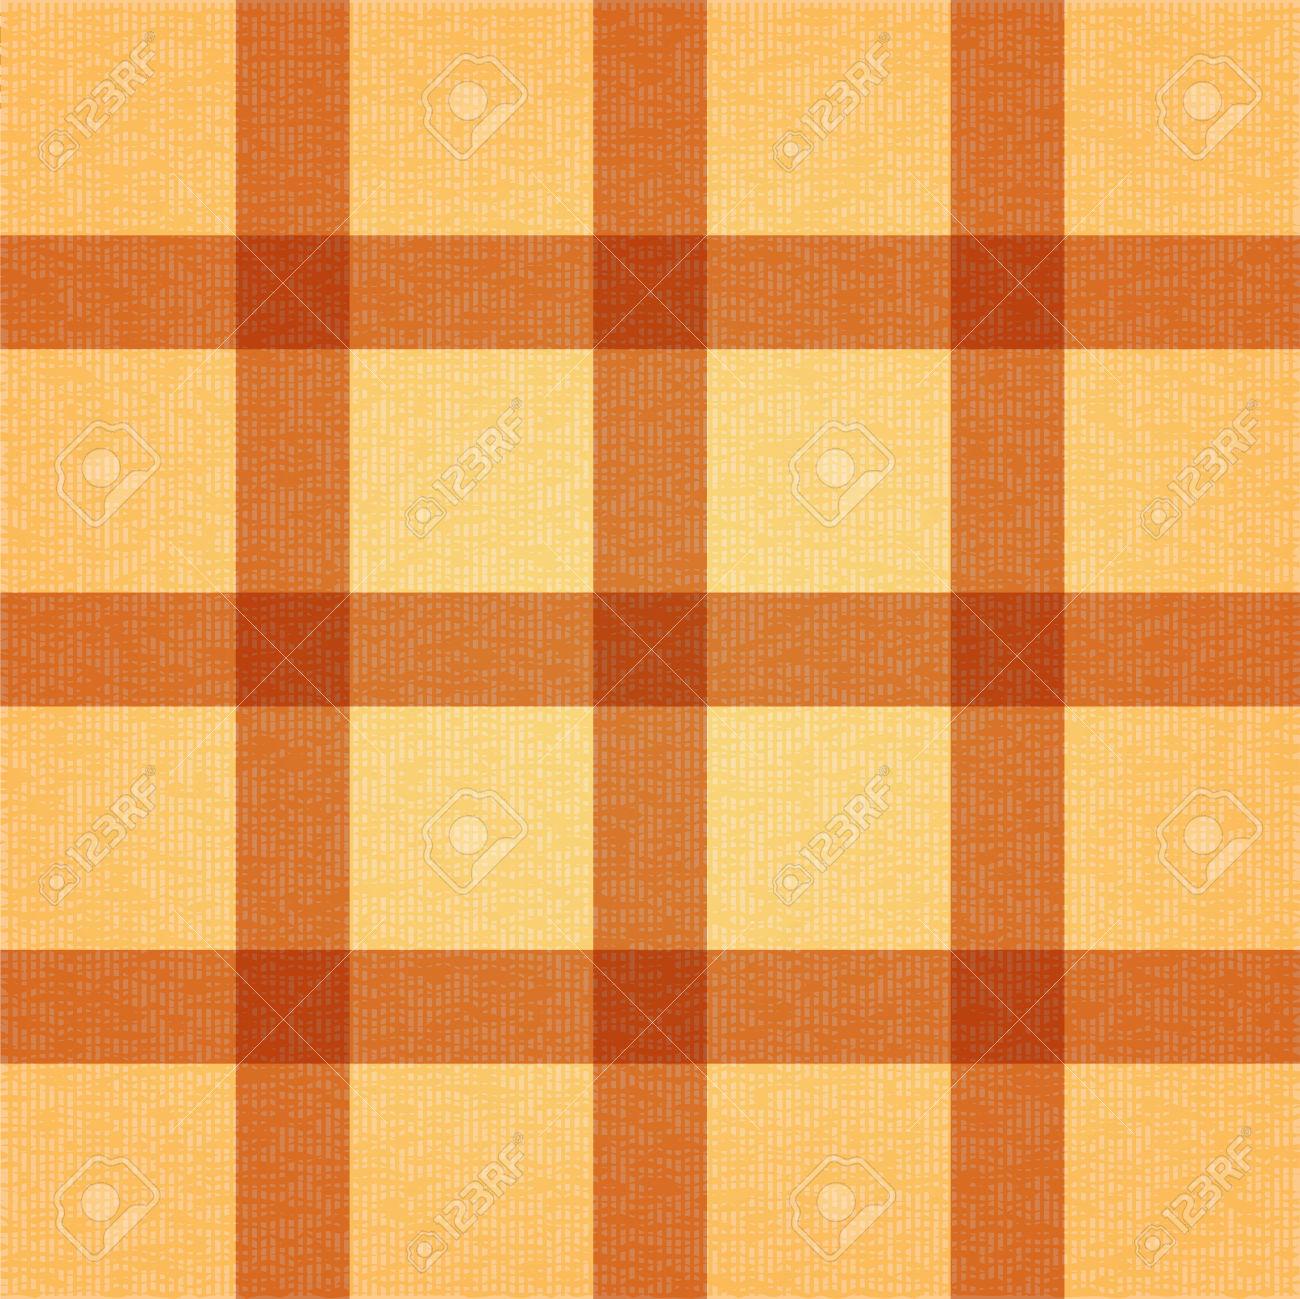 Retro Textile Background With Light Brown Stripes. Textile Texture.